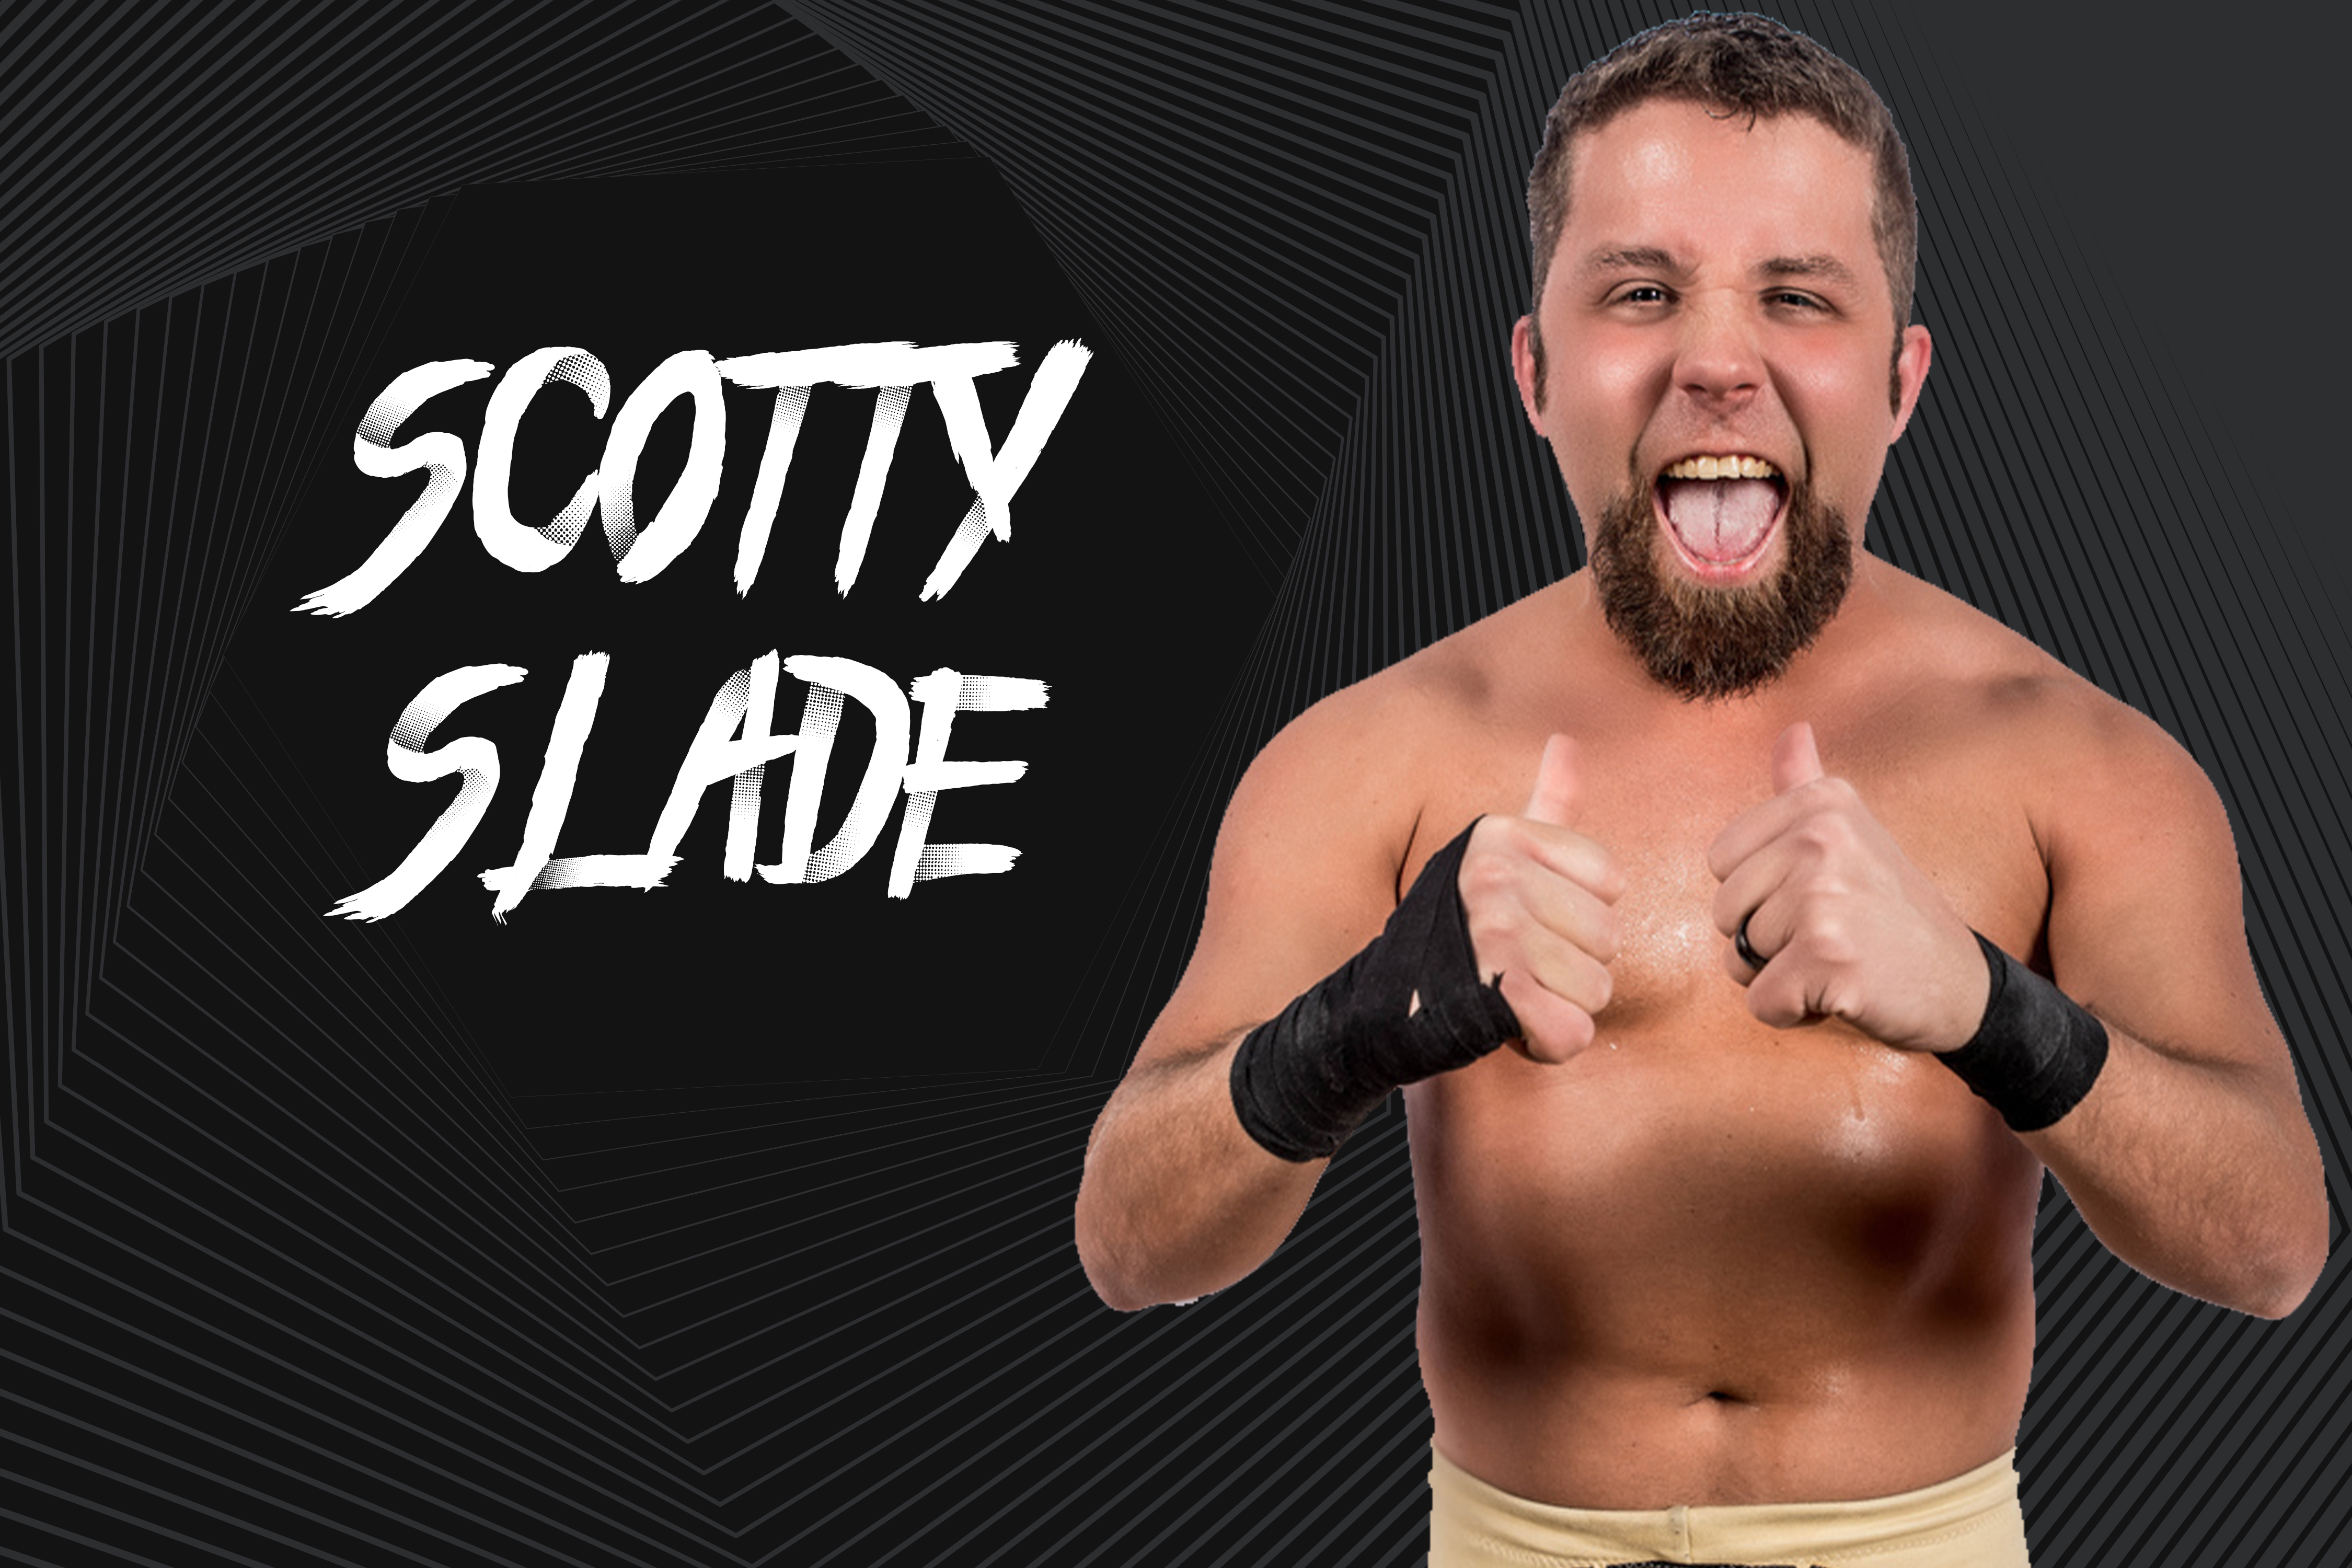 Scotty Slade